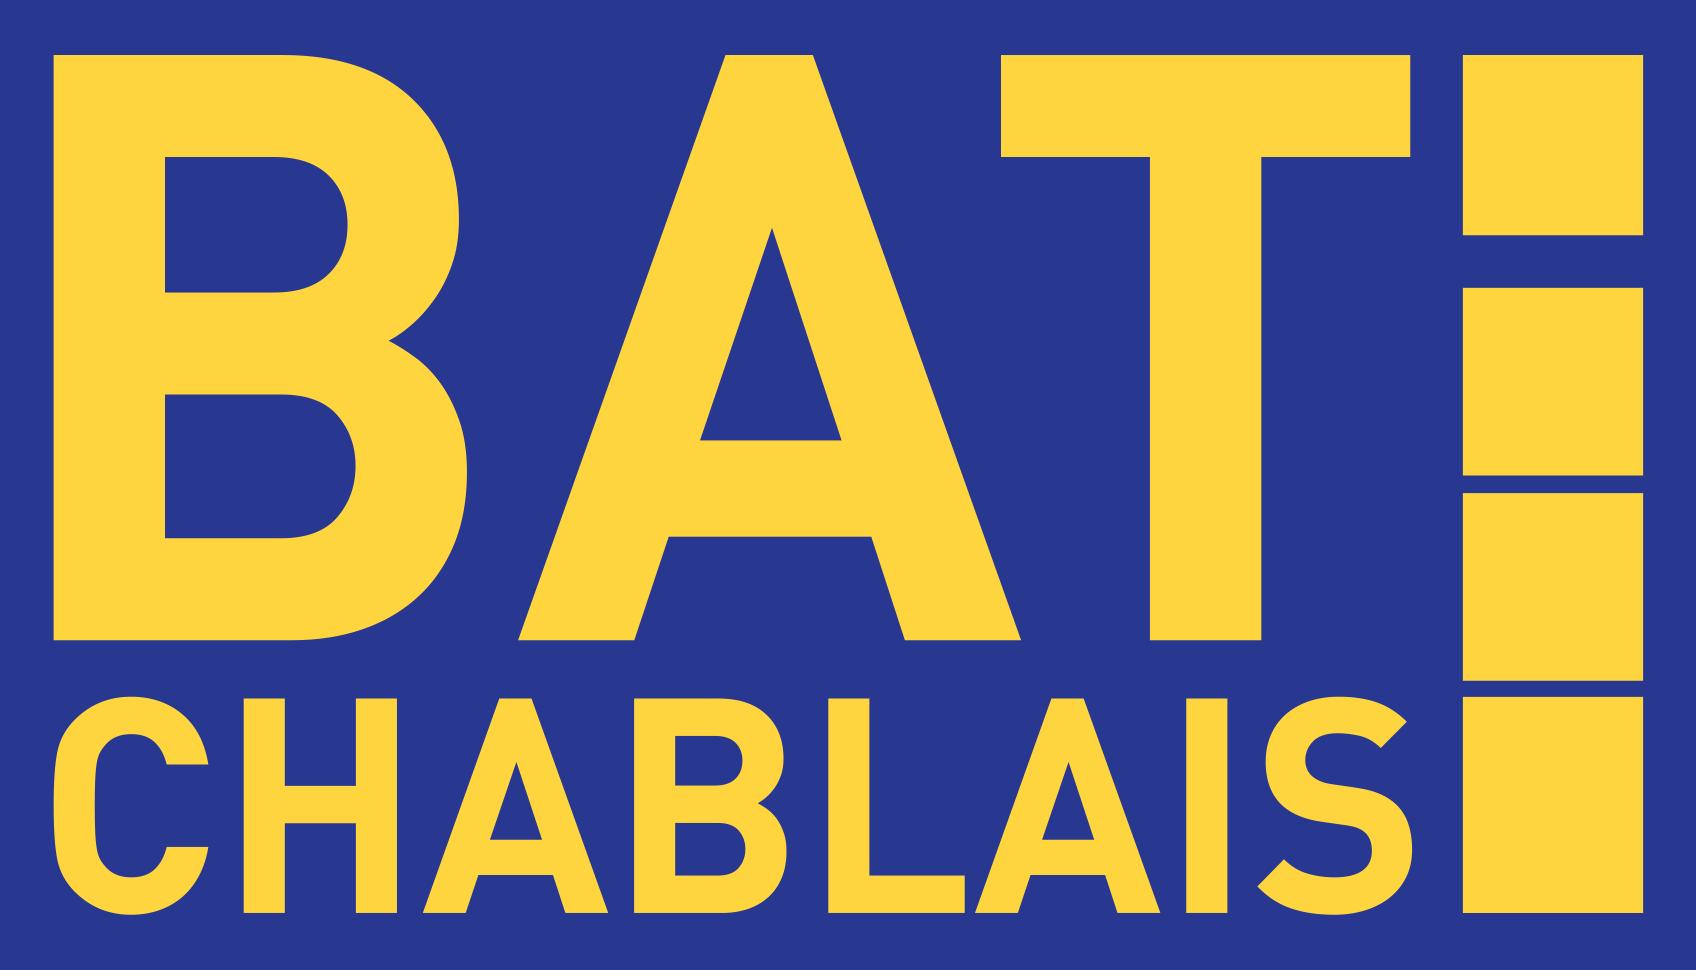 Bati Chablais - Thonon les Bains